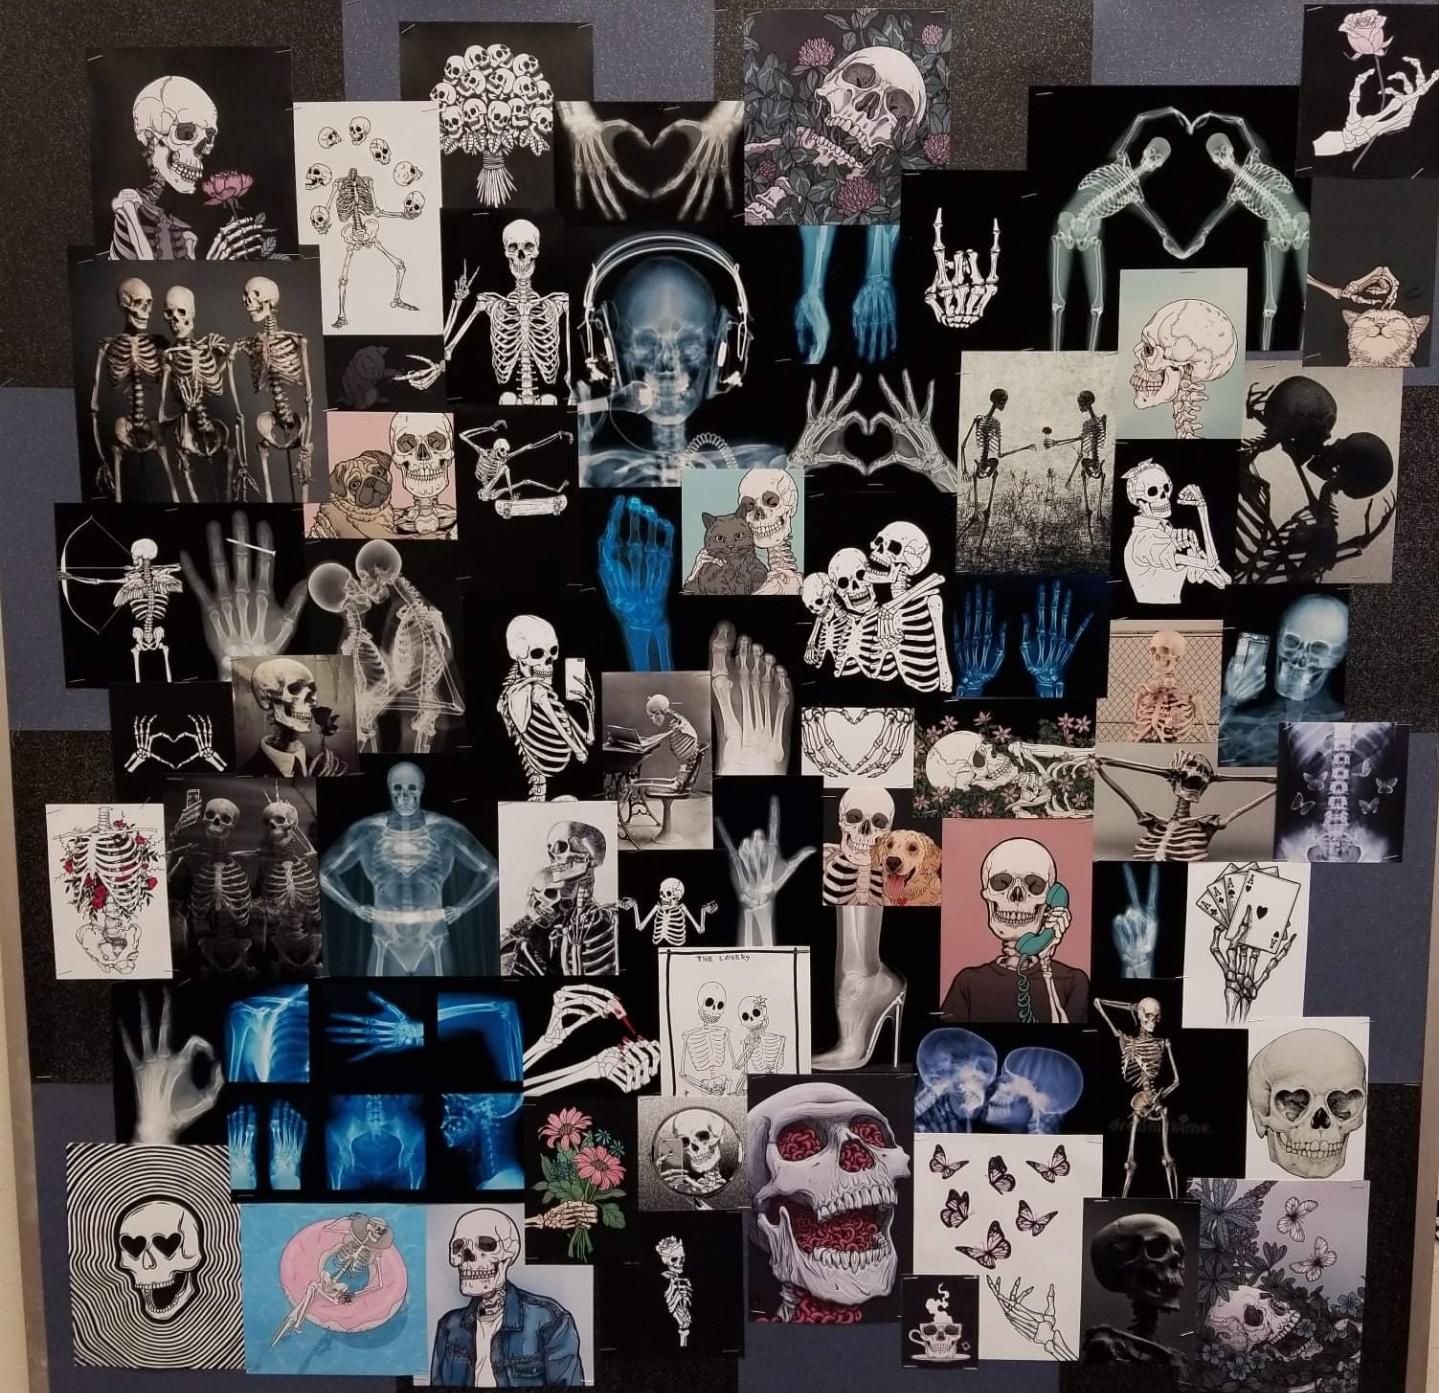 Skeleton Wall